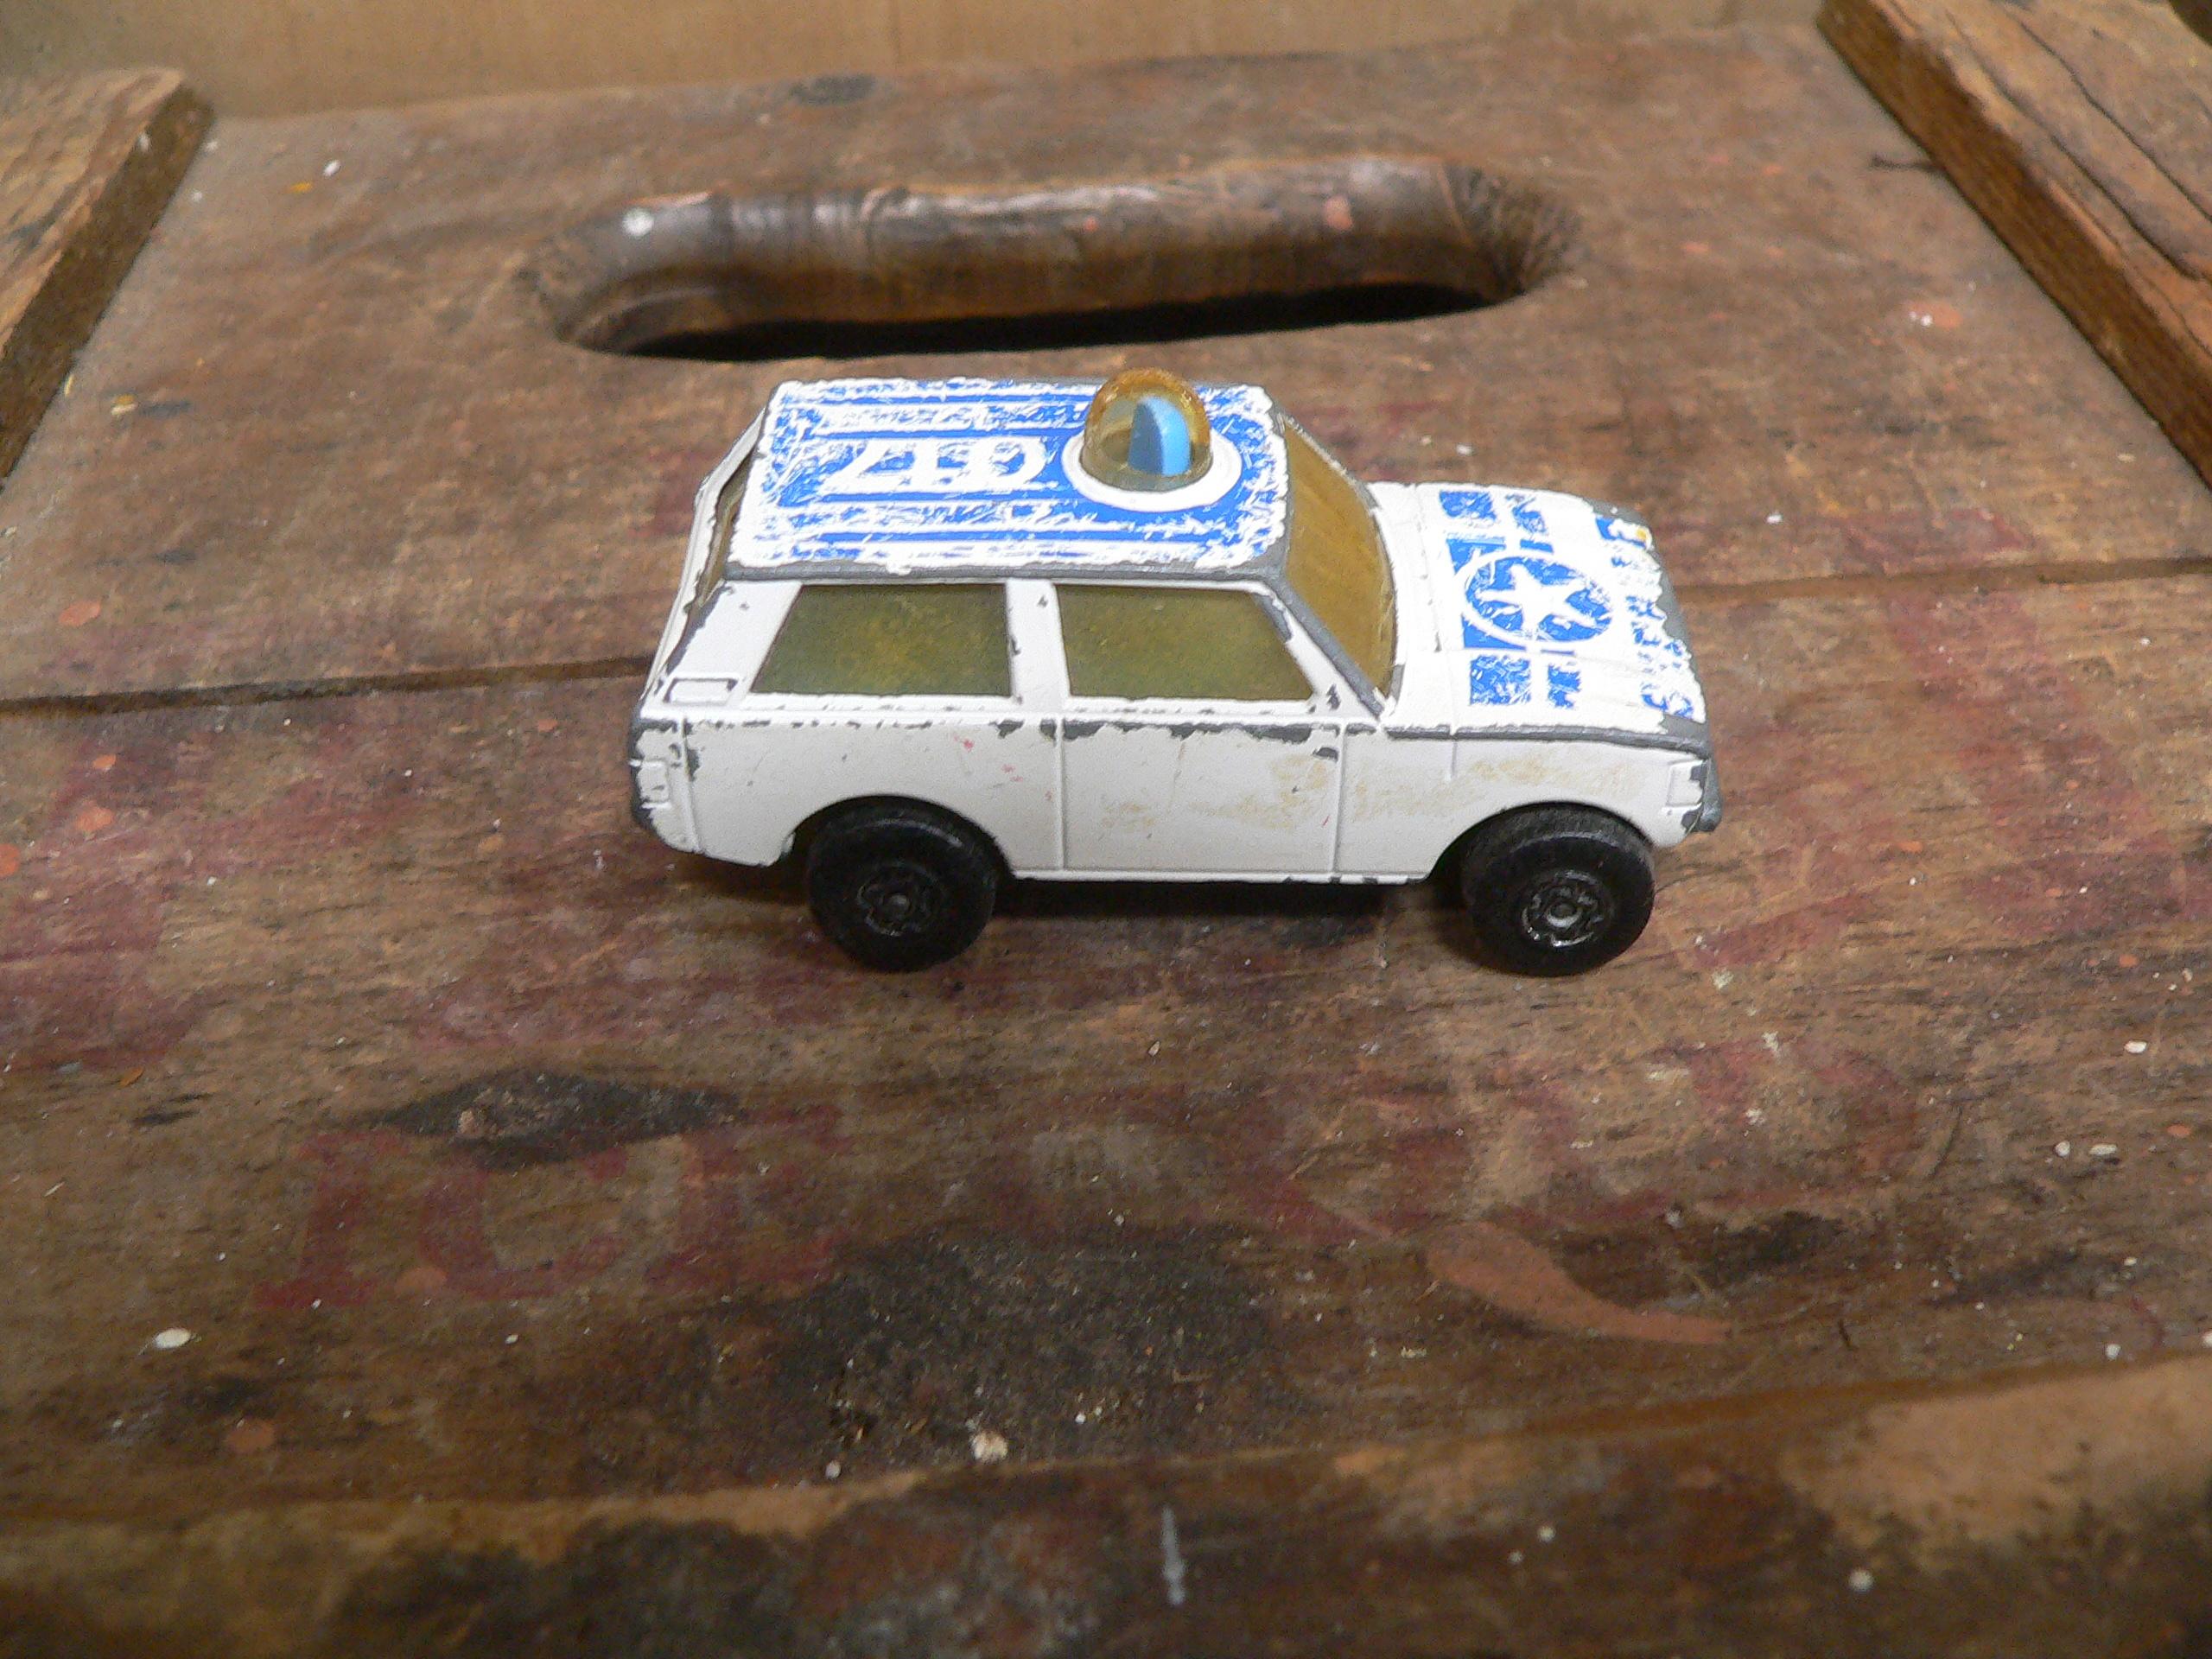 Camion police patrol shérif # 5854.3